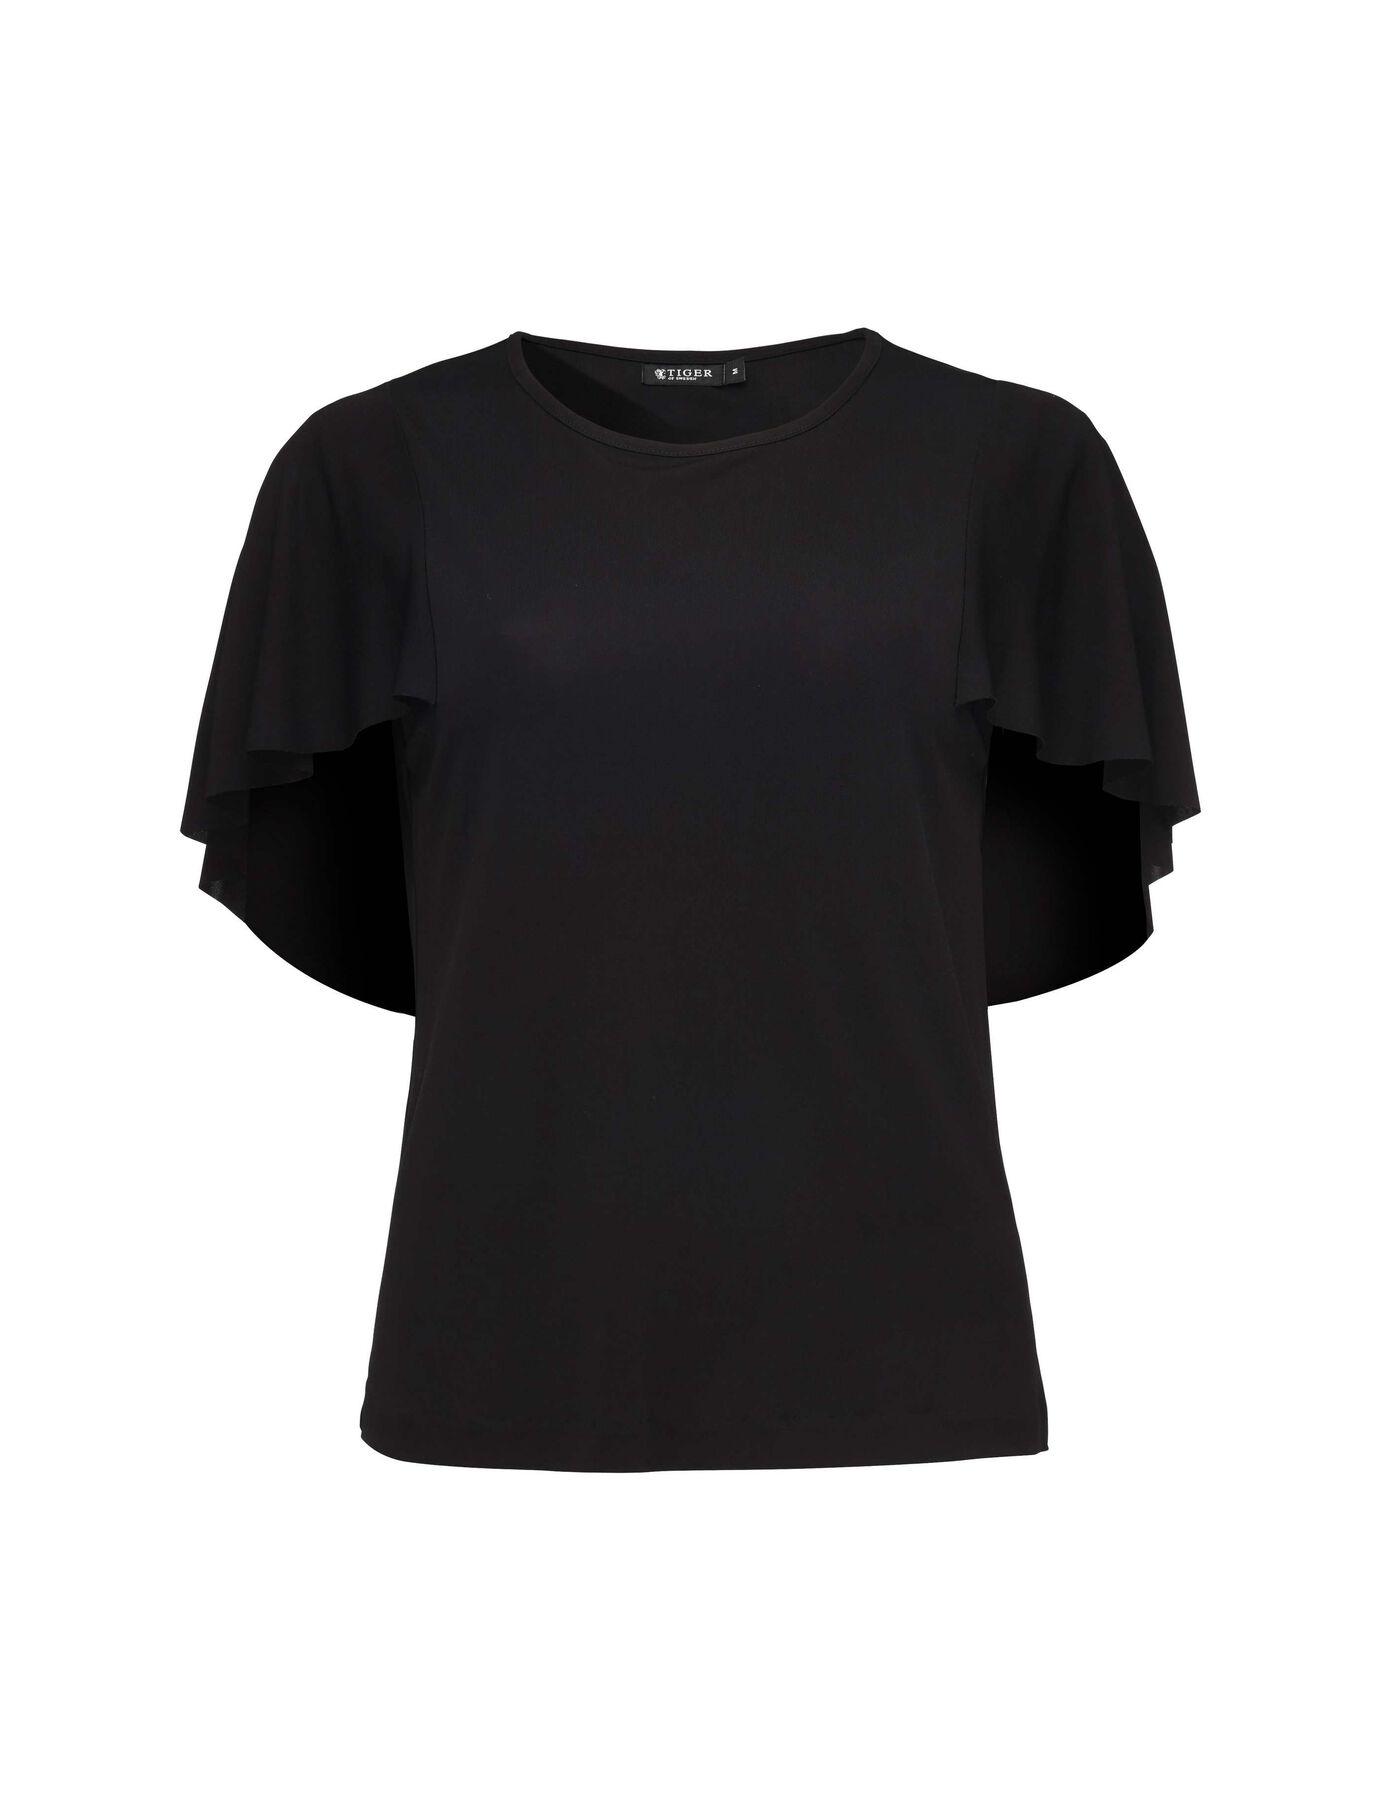 Elula t-shirt